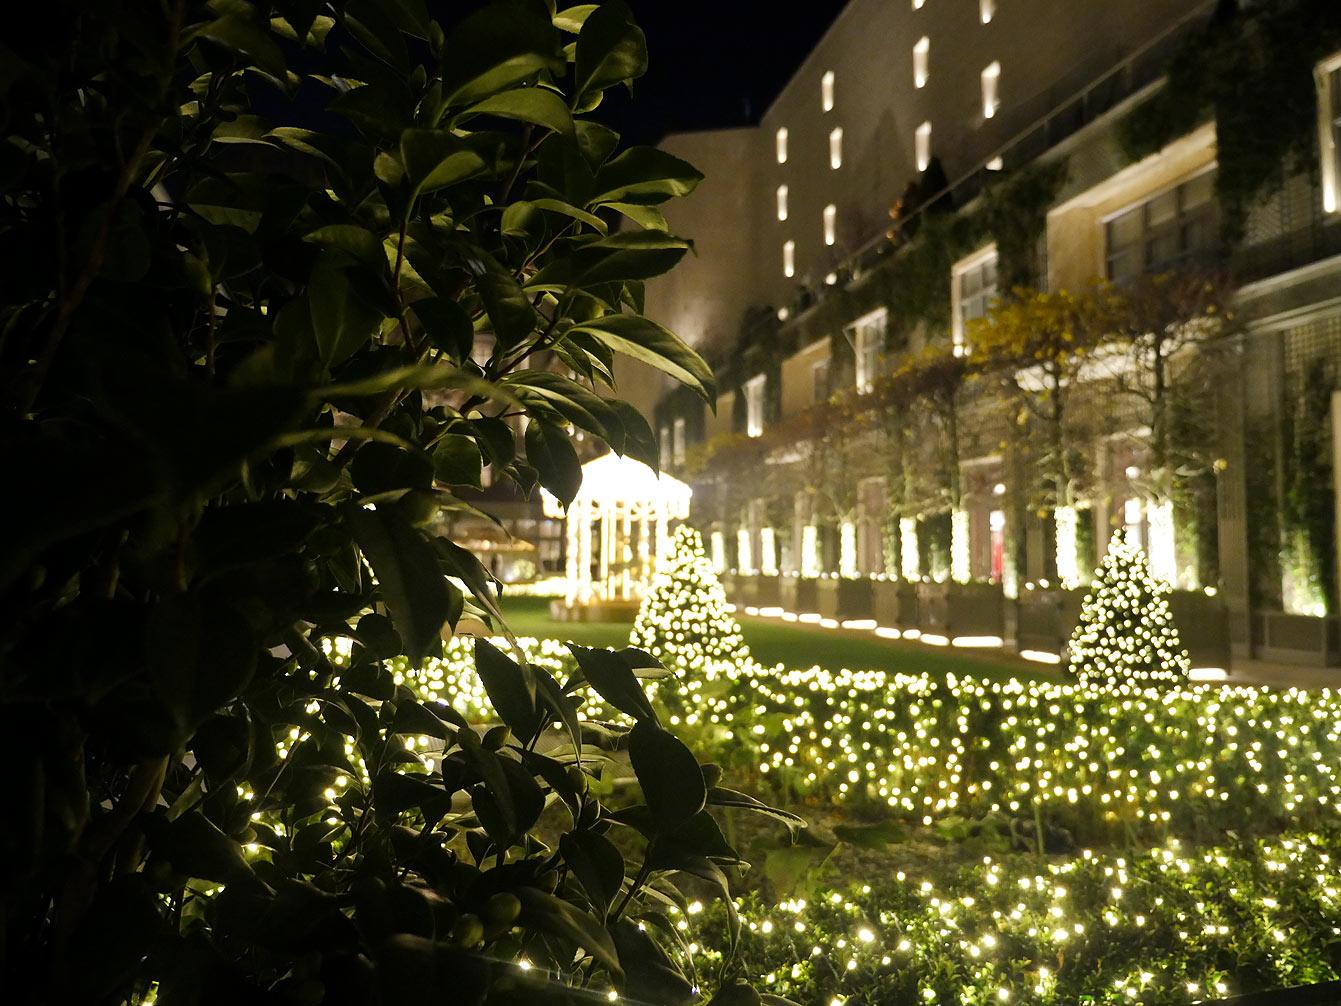 Jardins de l'Hôtel Ritz Paris